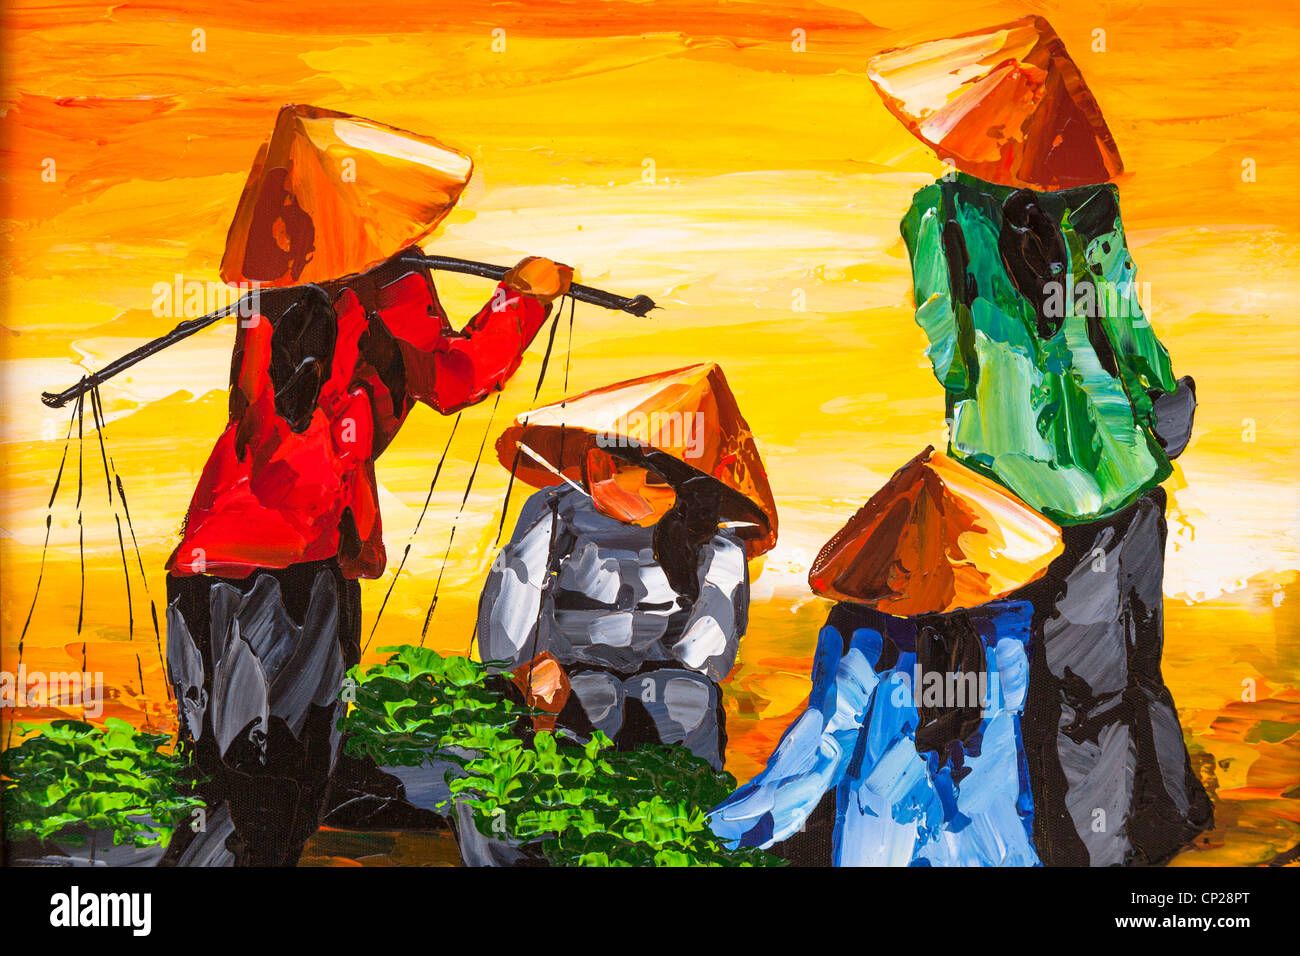 Art Artwork Paintings Vietnam Stock Photos & Art Artwork Paintings ...